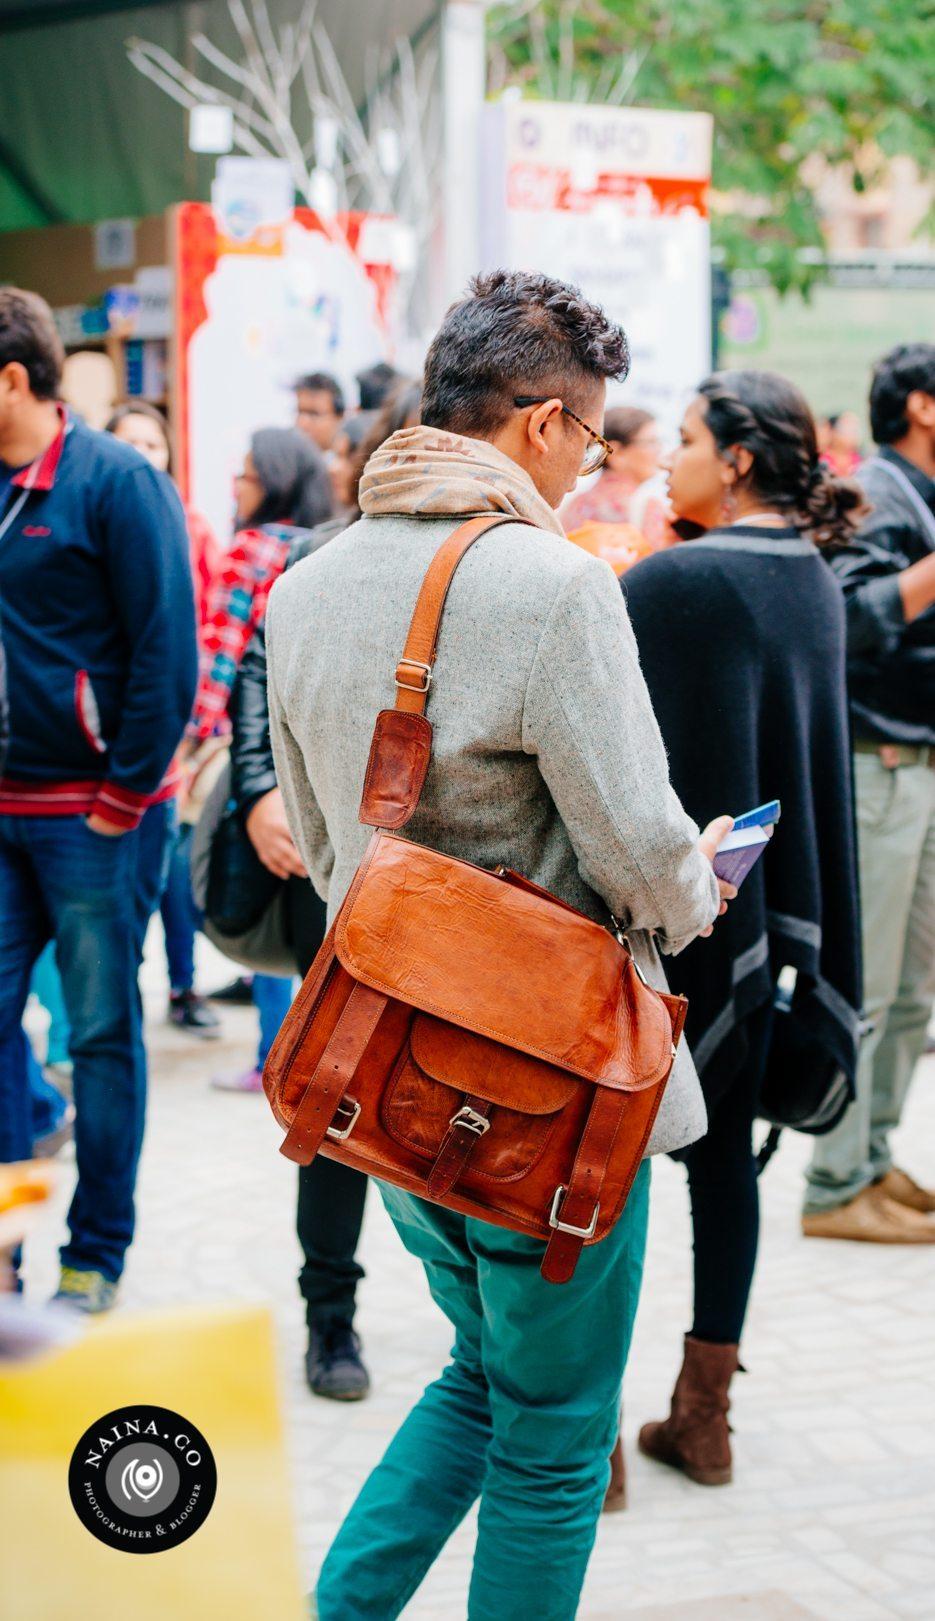 Naina.co-Raconteuse-Visuelle-Photographer-Blogger-Storyteller-Luxury-Lifestyle-January-2015-Jaipur-Literature-Festival-StRegis-LeMeridien-ZeeJLF-EyesForStreetStyle-14